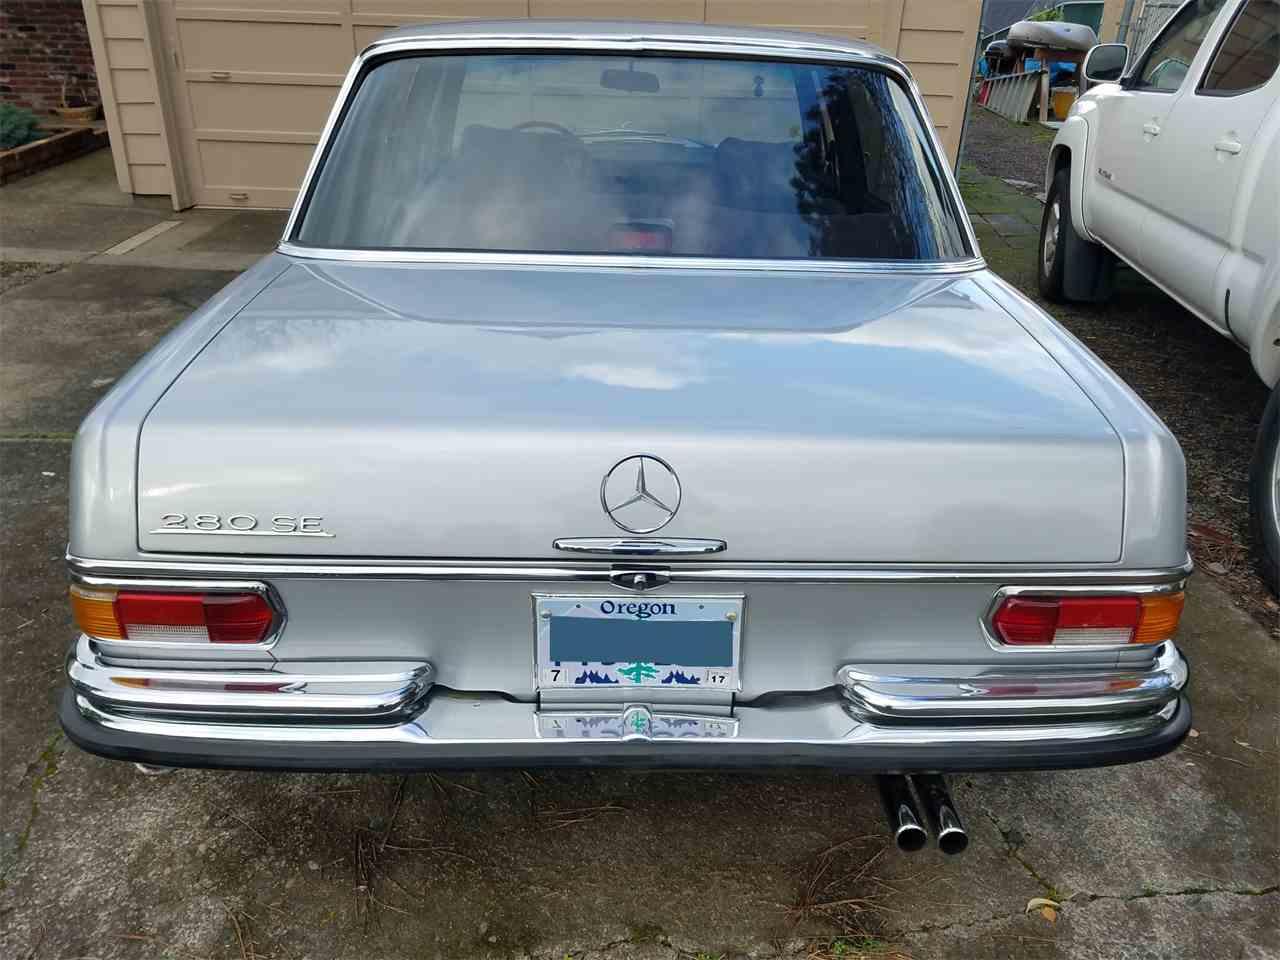 1969 mercedes benz 280se for sale cc for Mercedes benz portland oregon